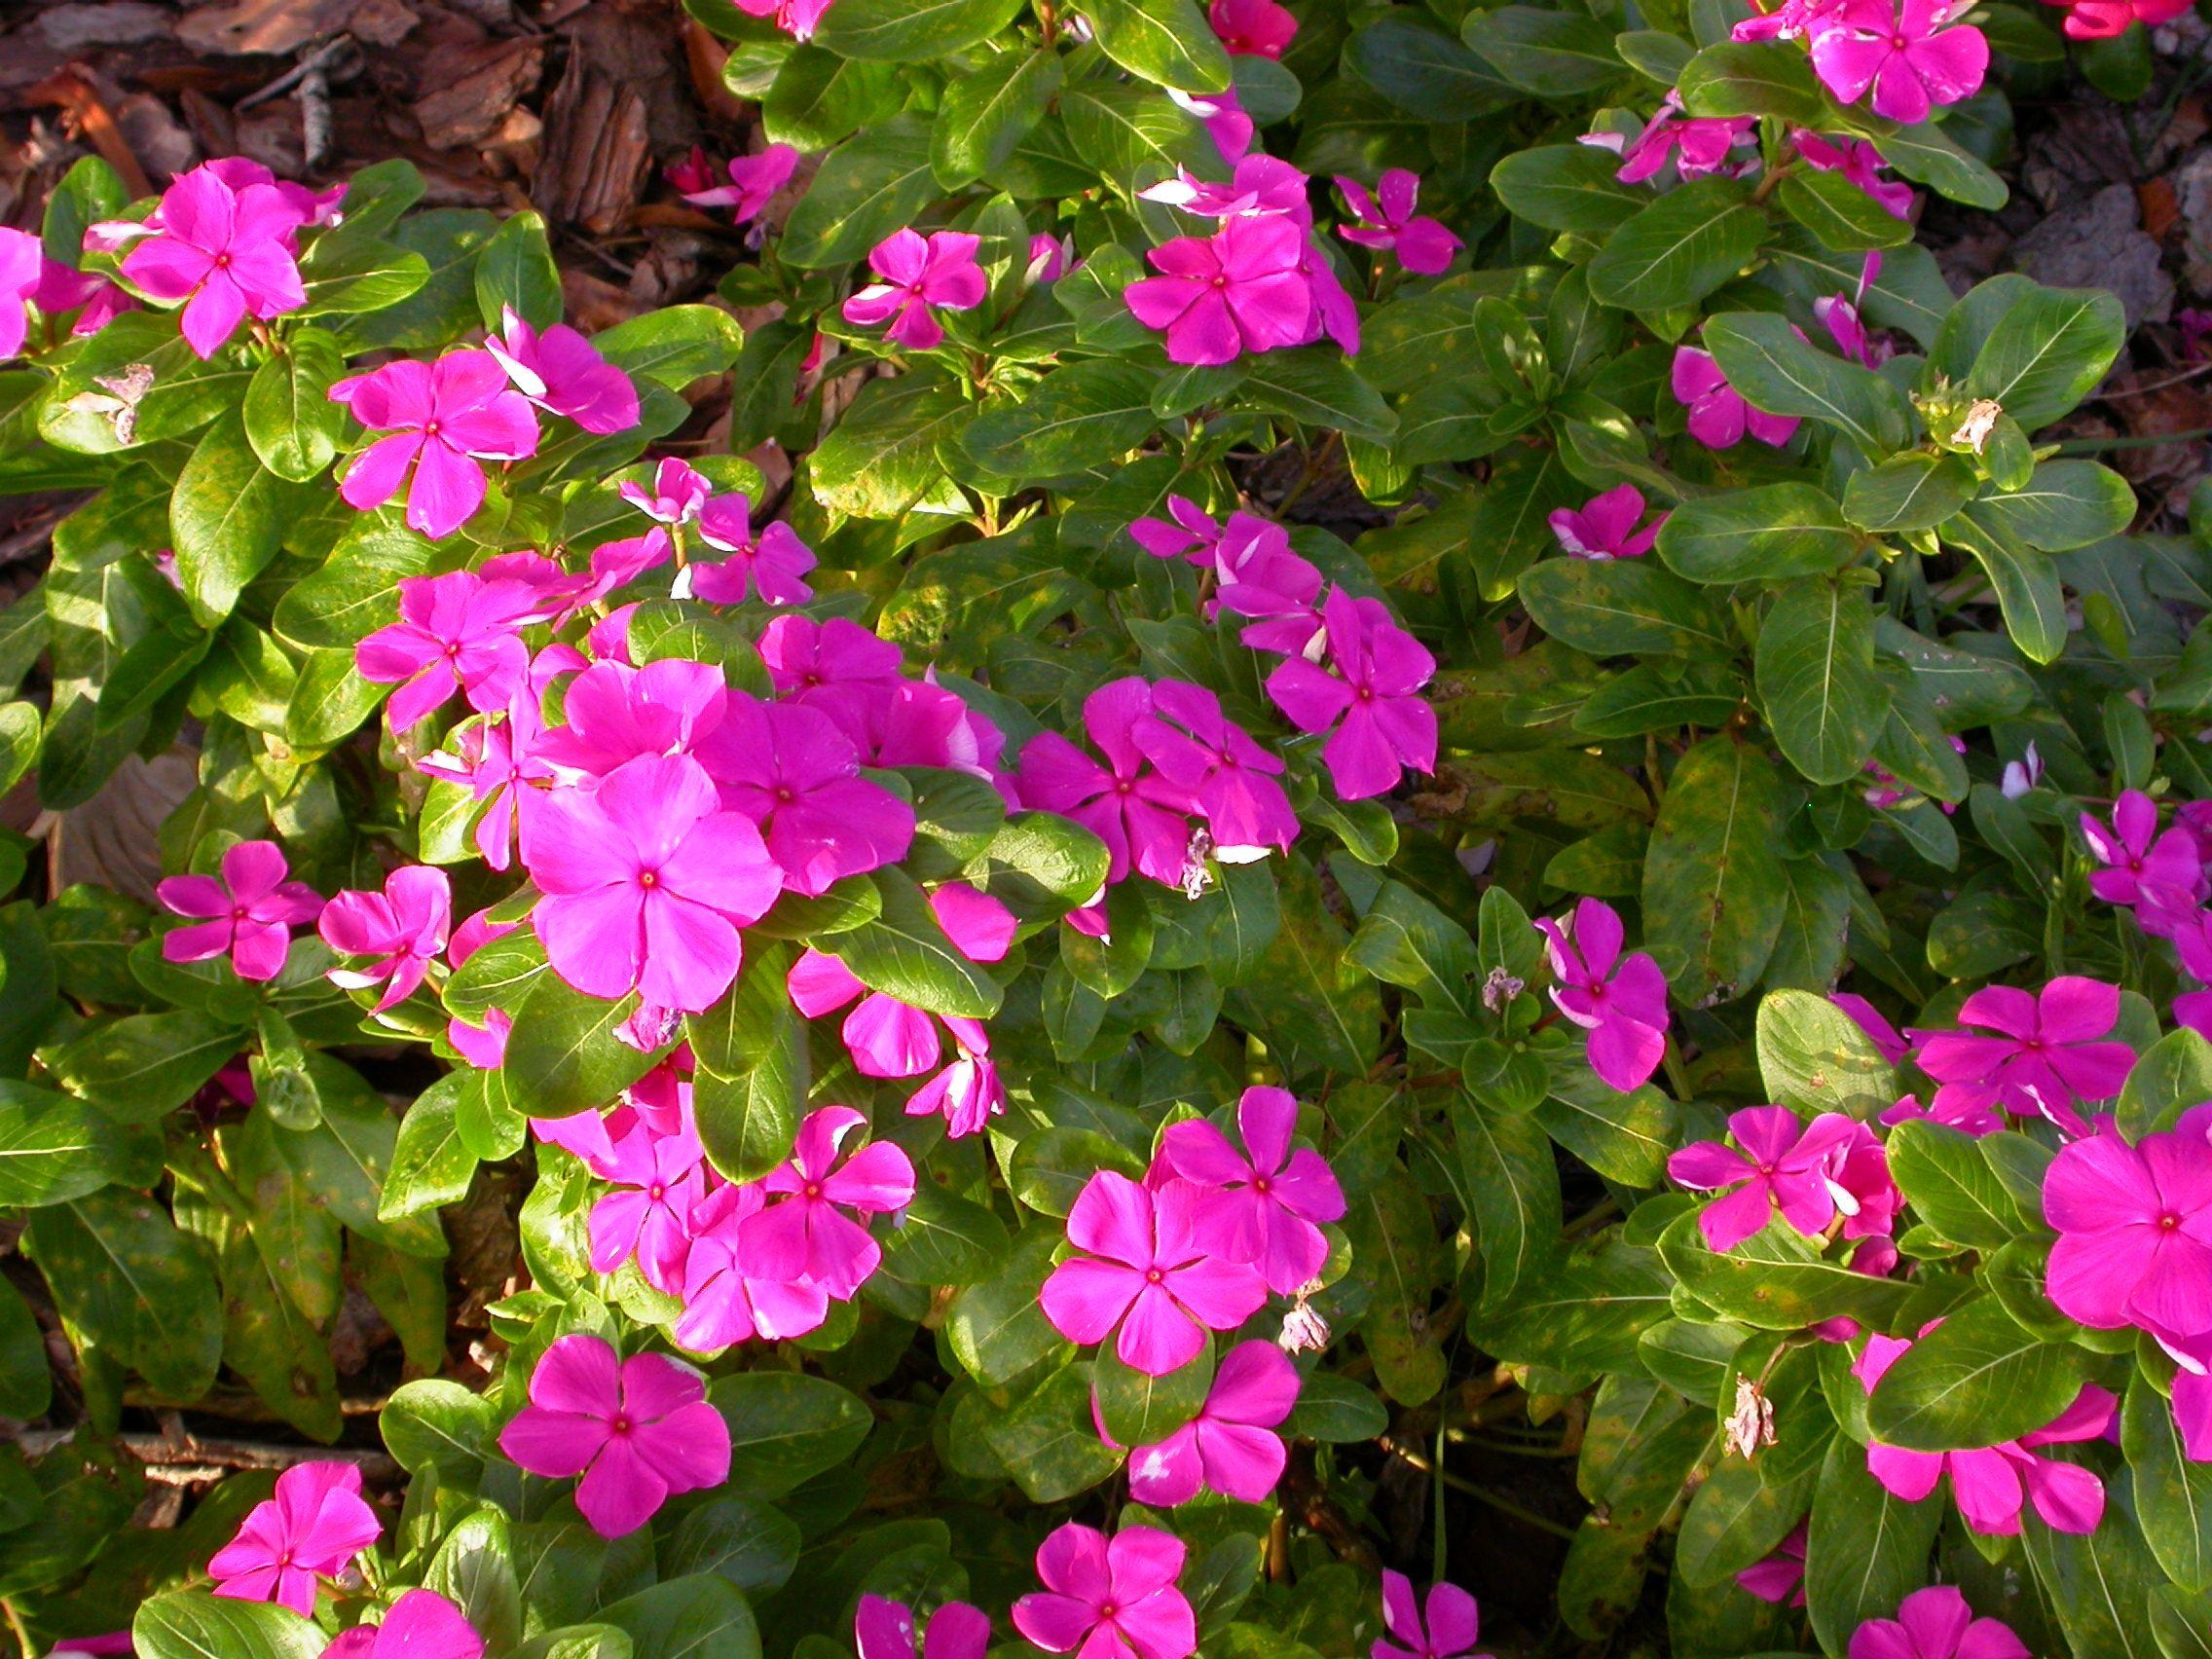 Vinca flowers impatiens alternatives pinterest flowers vinca flowers izmirmasajfo Gallery